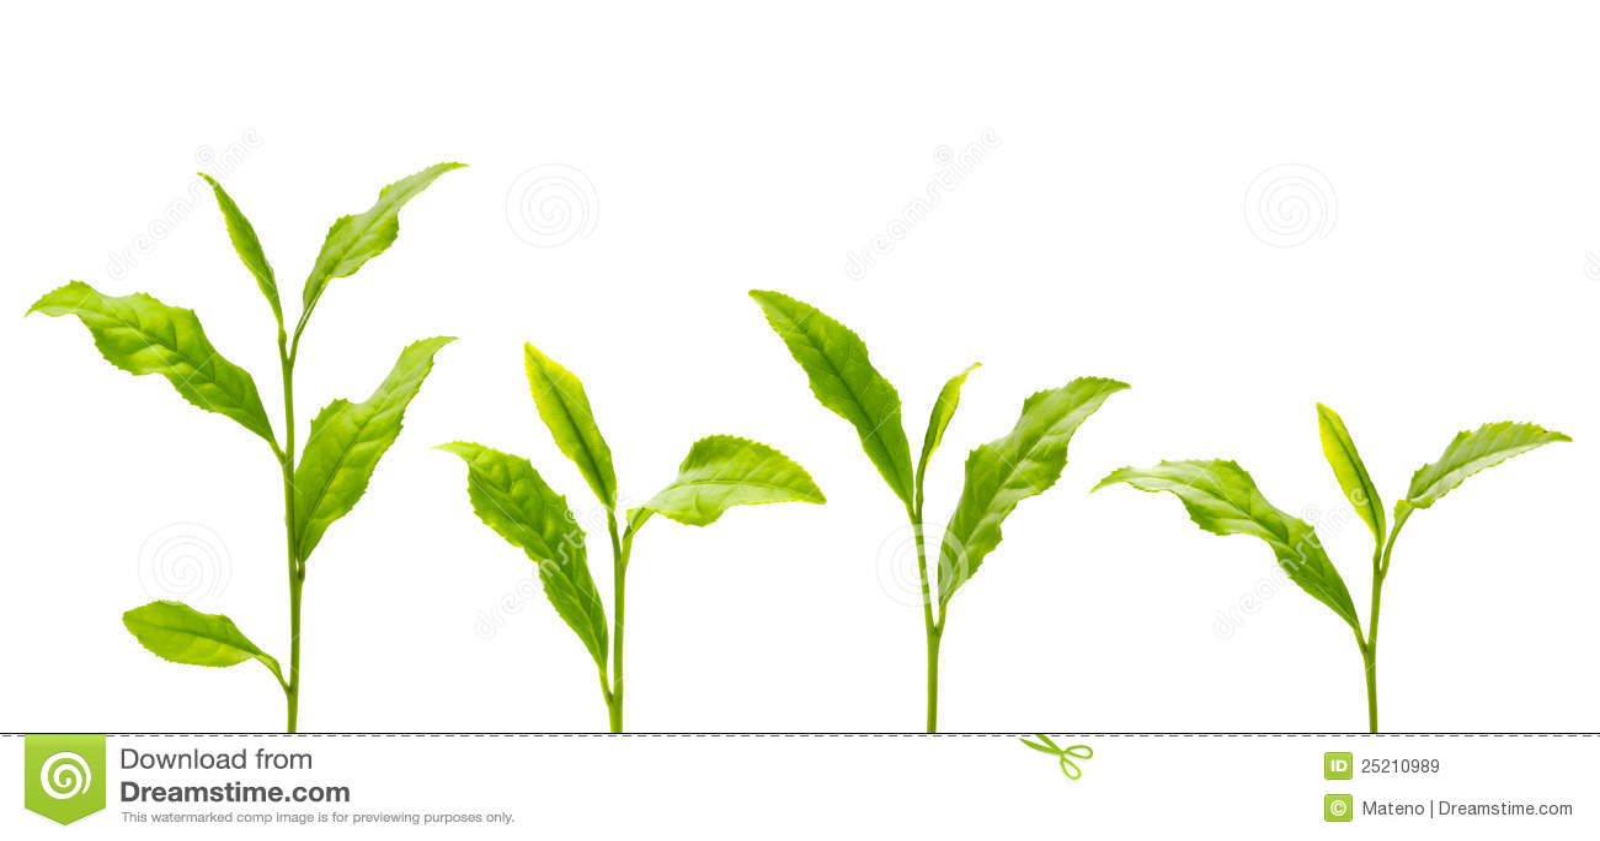 Green Tea Leaf Royalty Free Stock Images - Image: 25210989